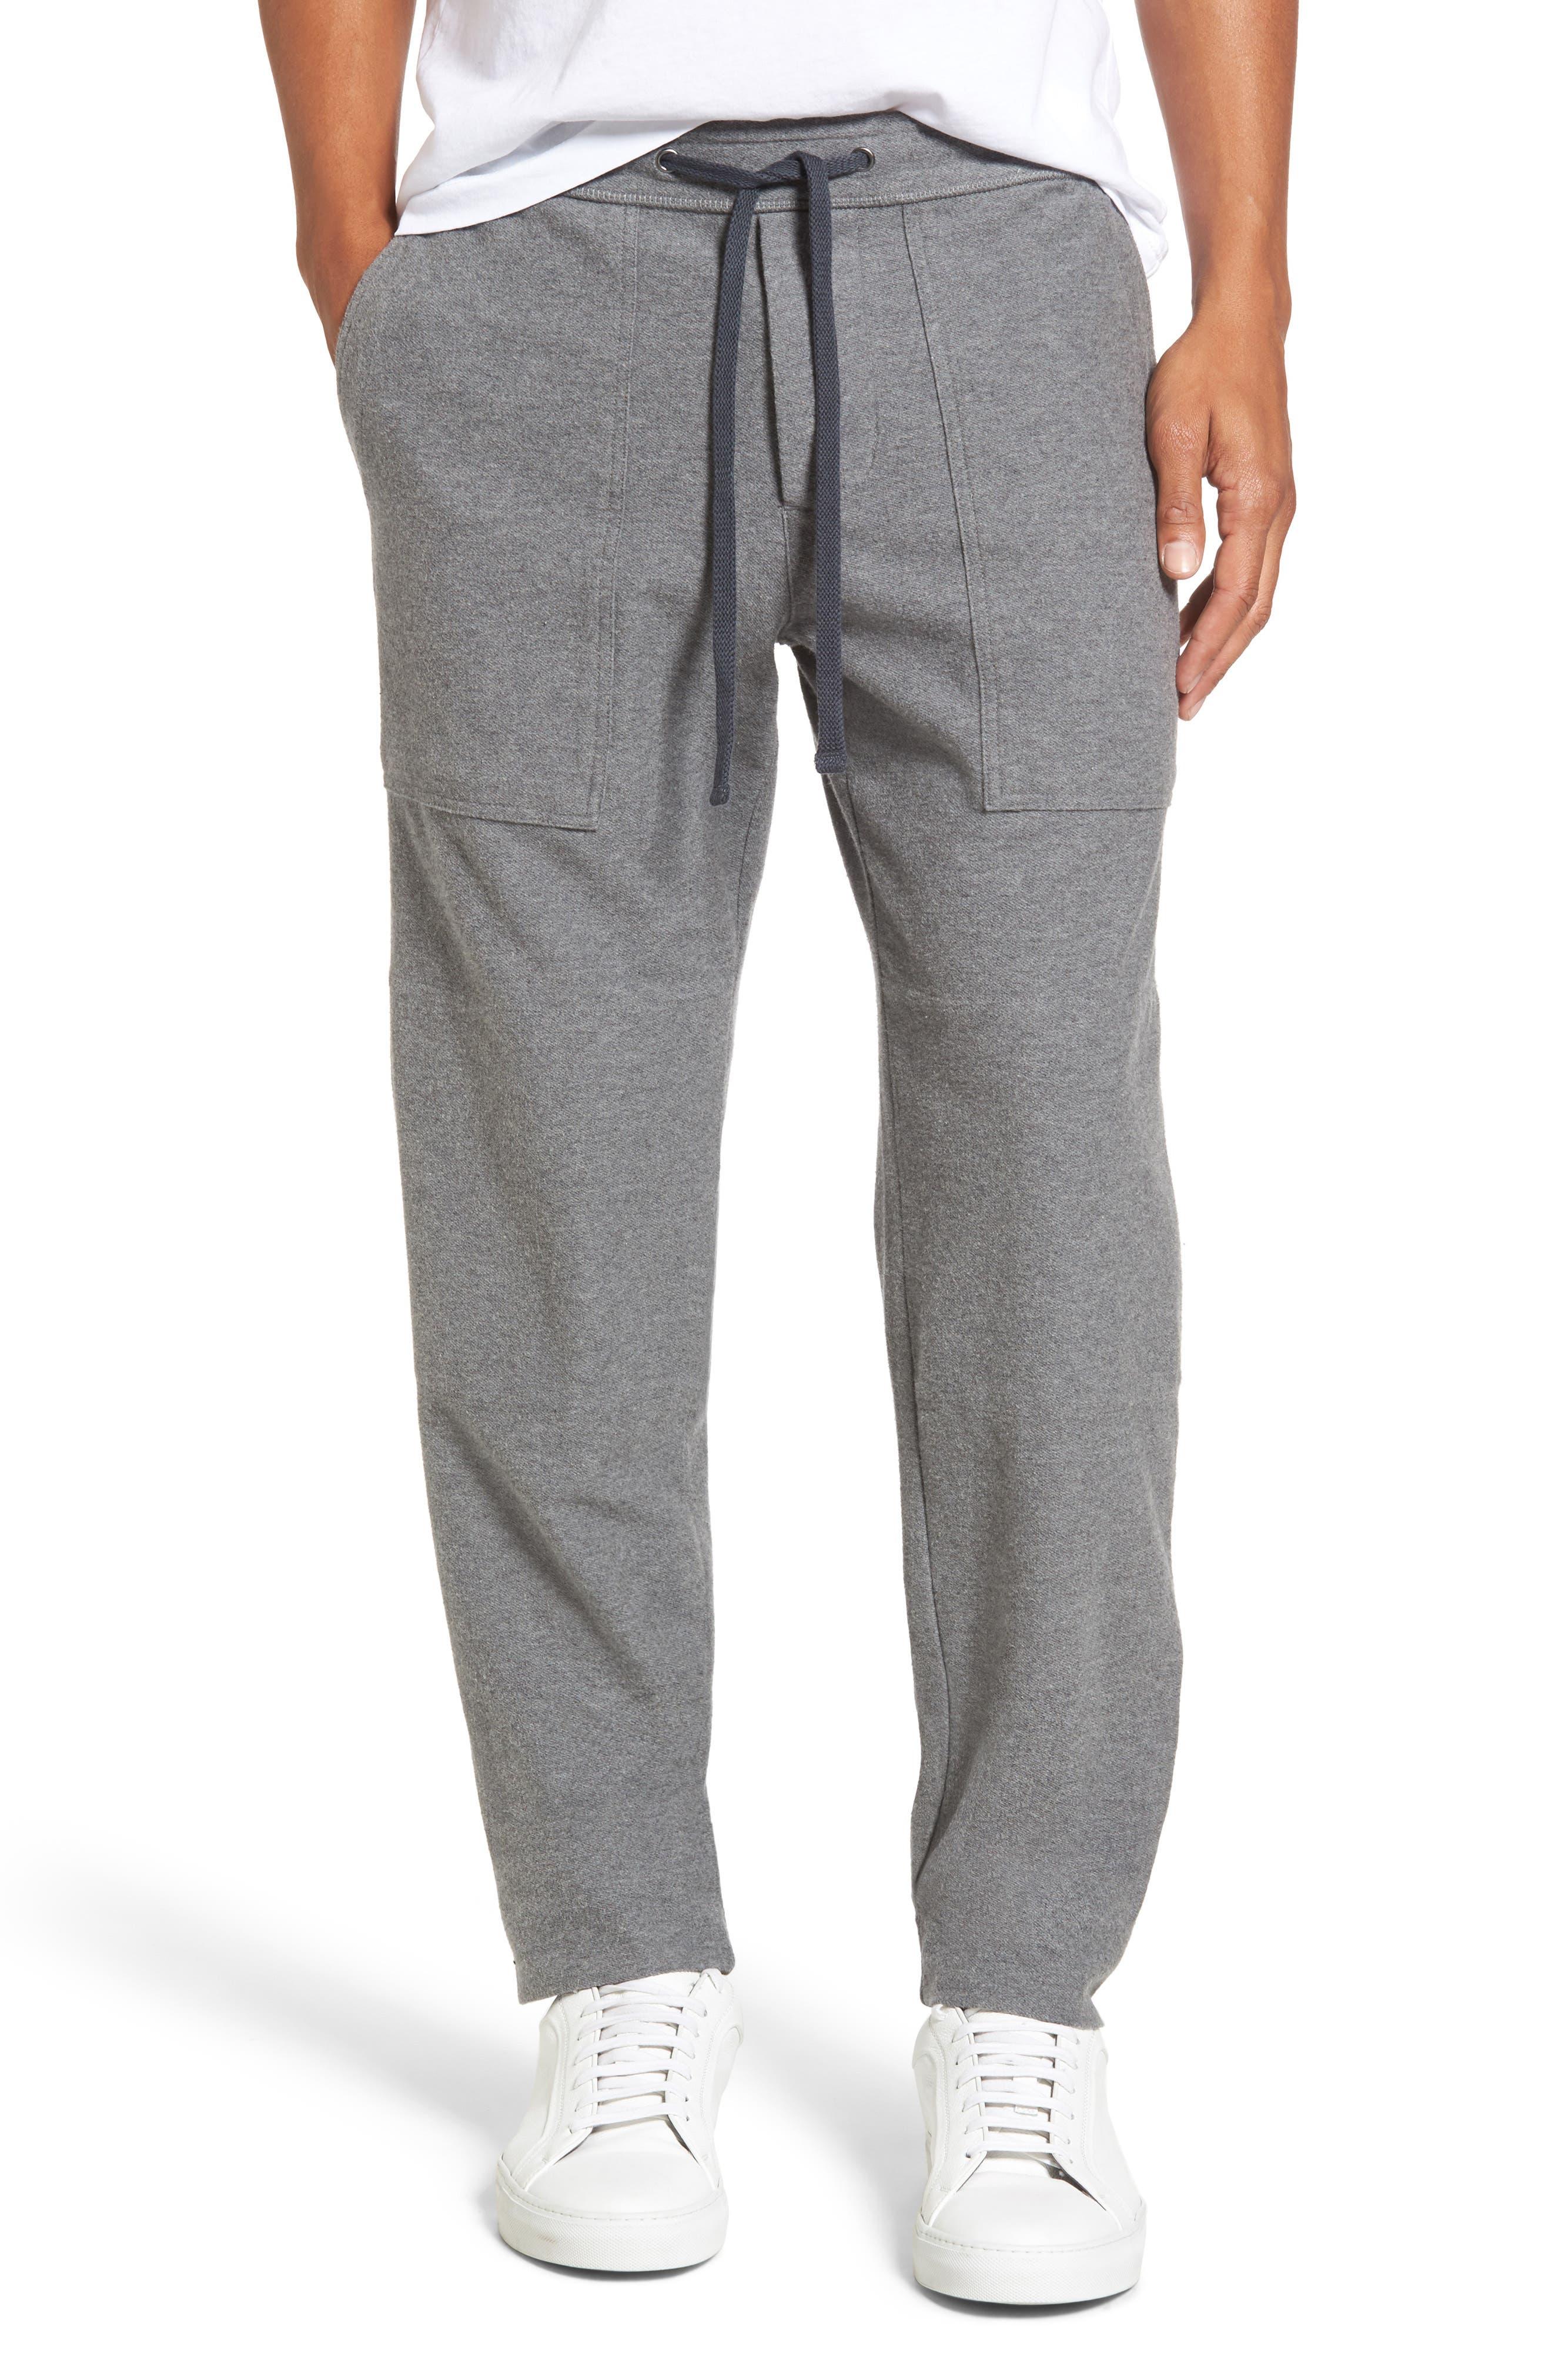 James Perse Heathered Knit Lounge Pants